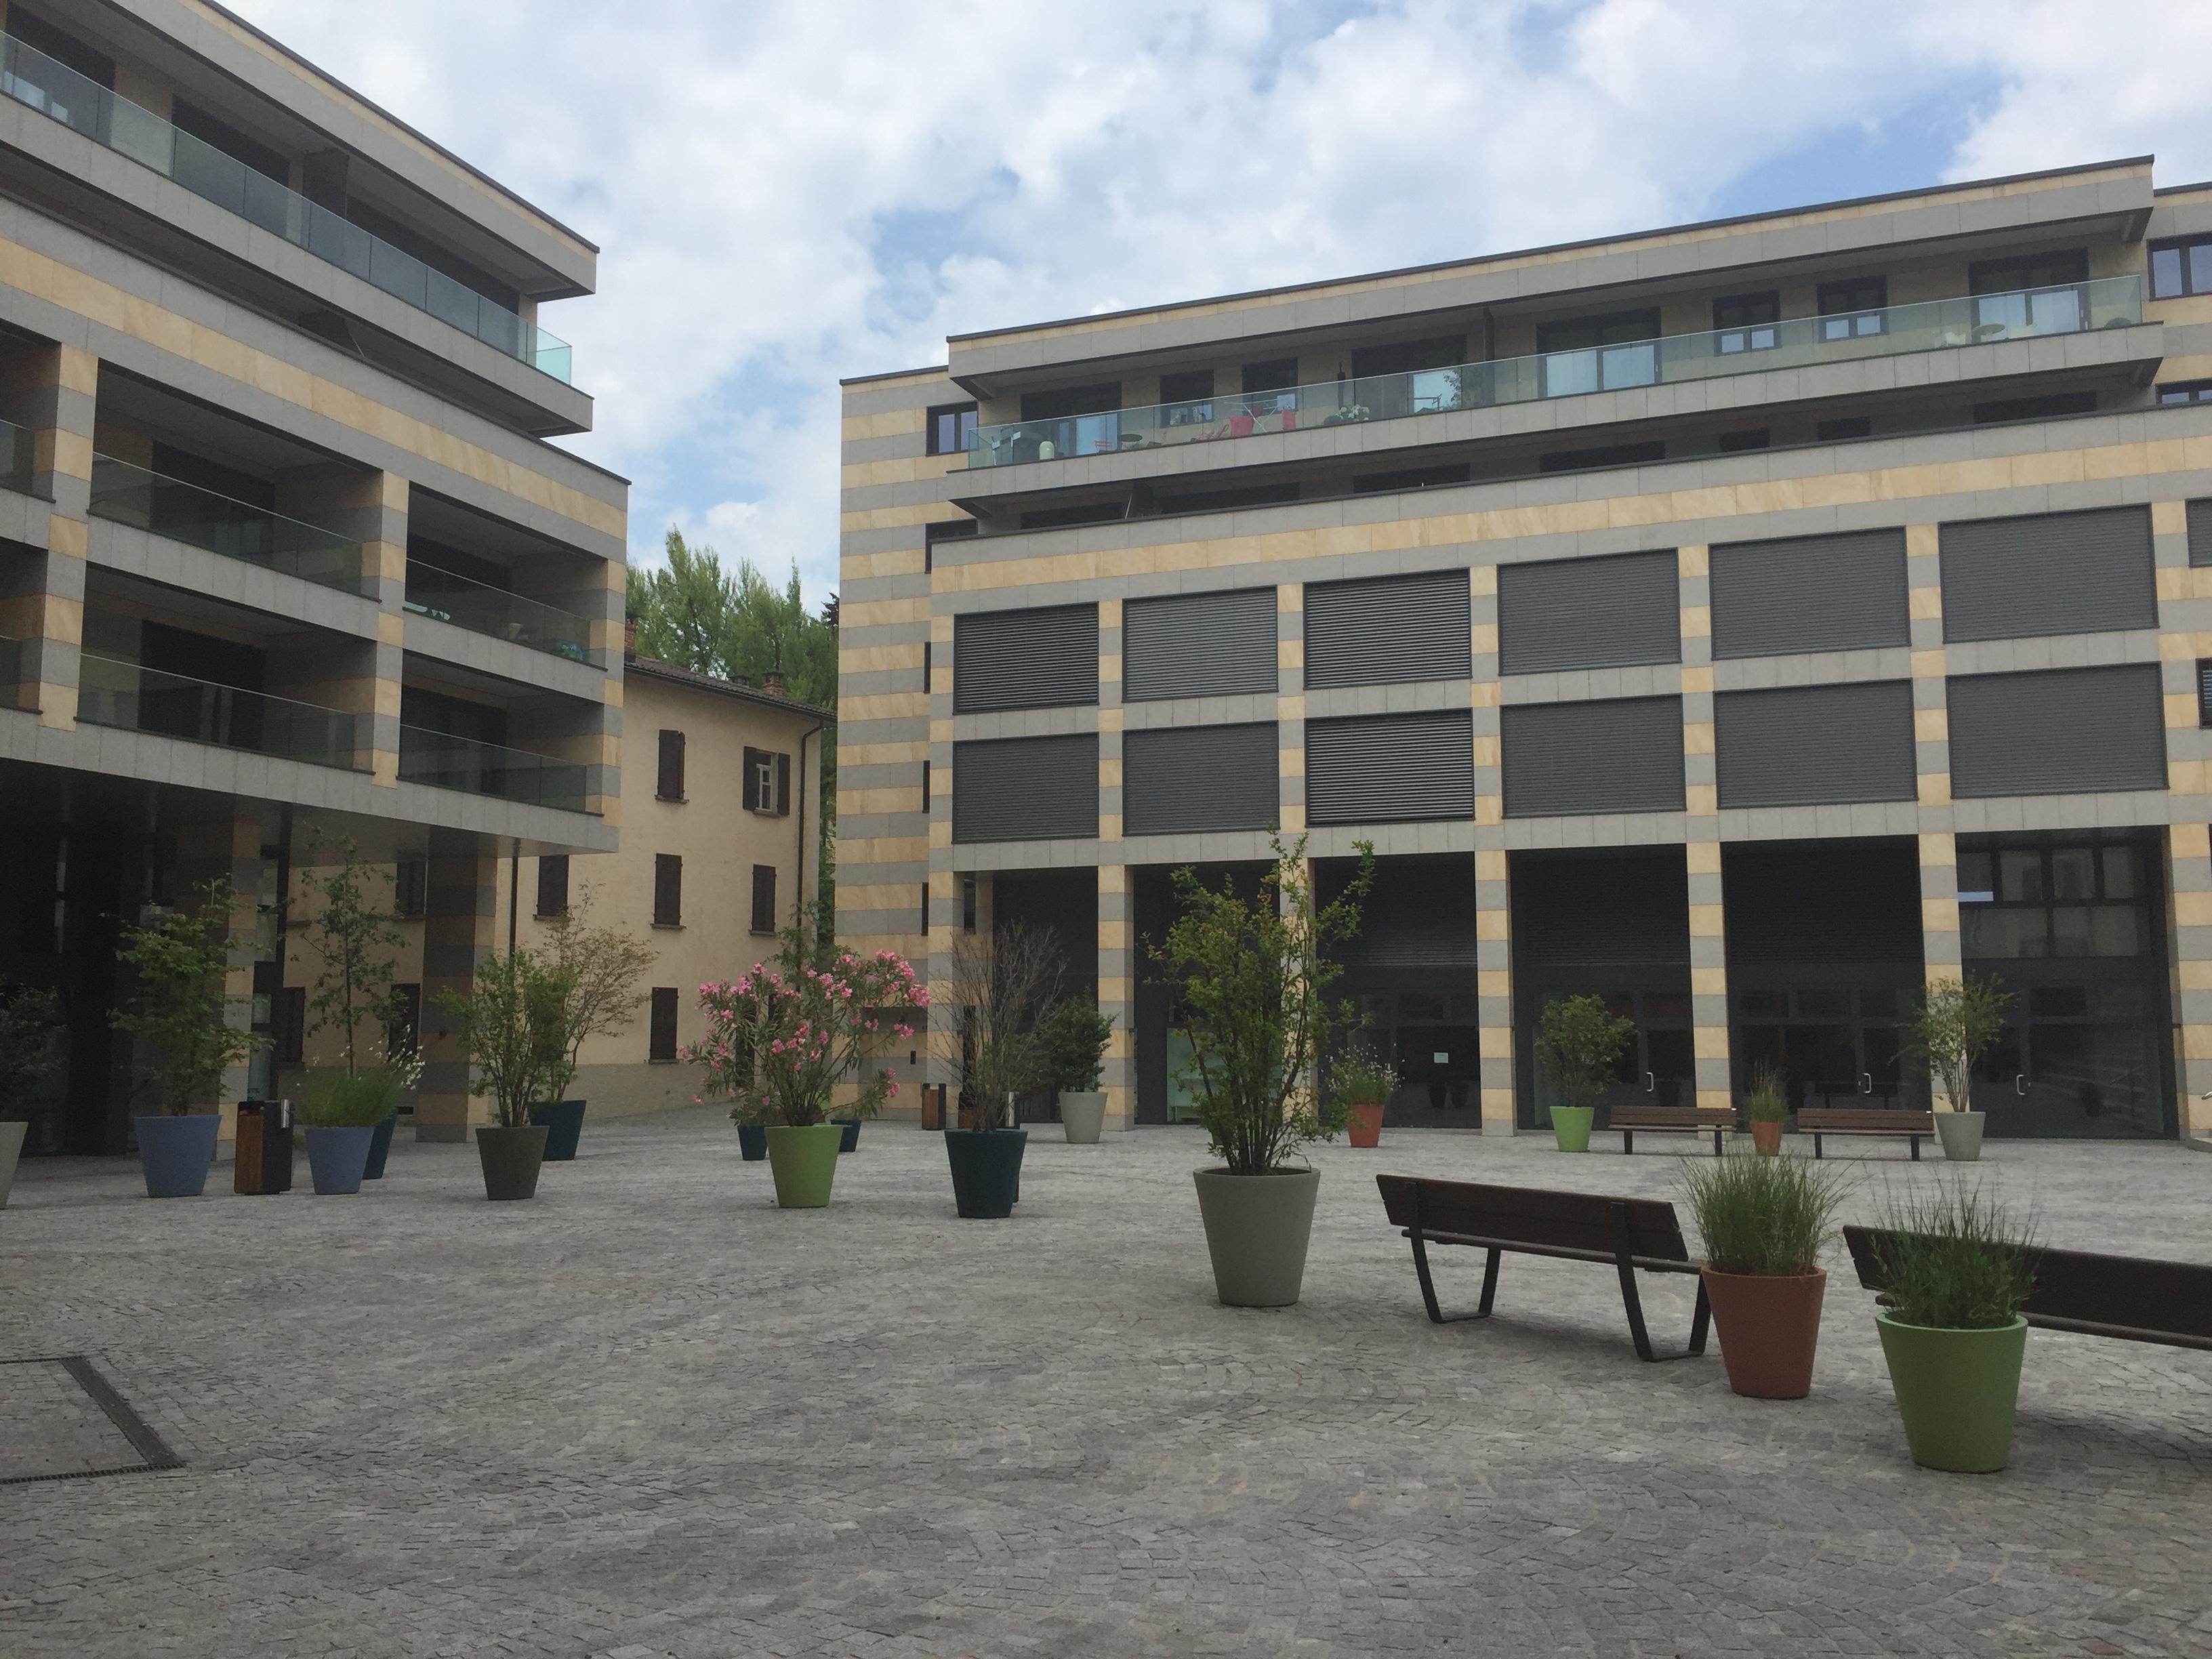 Piazza Santa Lucia